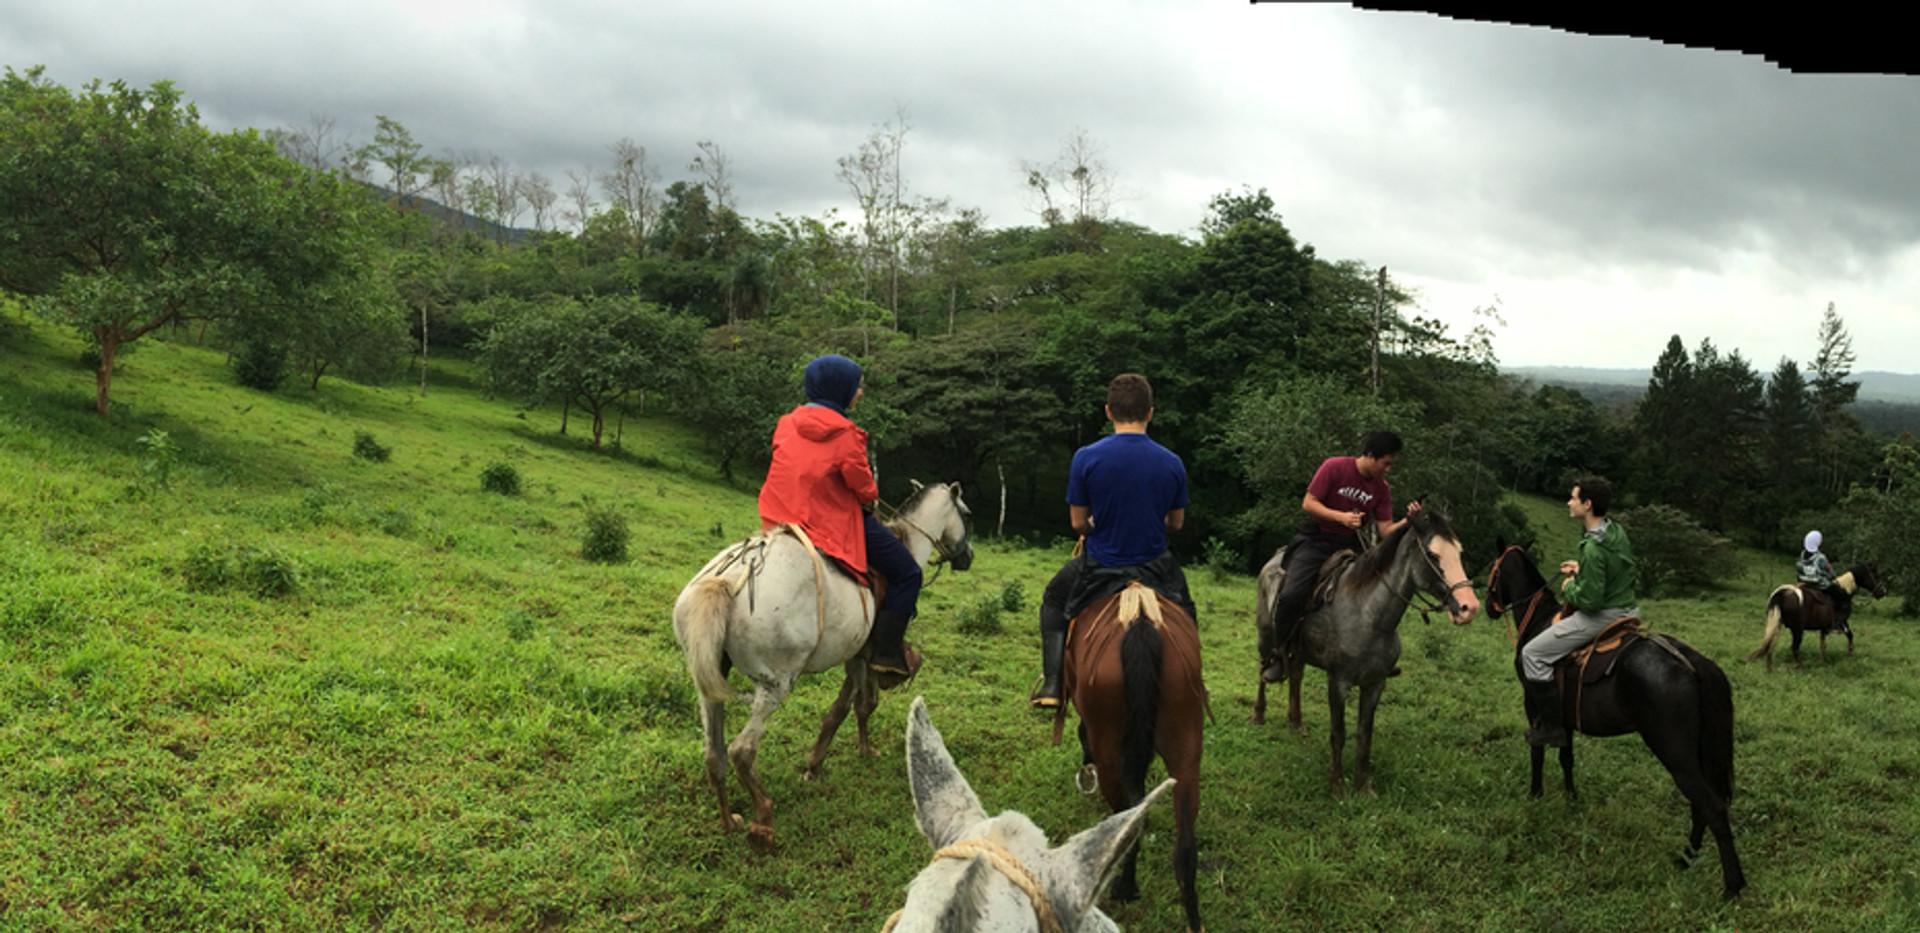 SOC Horseback Ride - Up the volcano